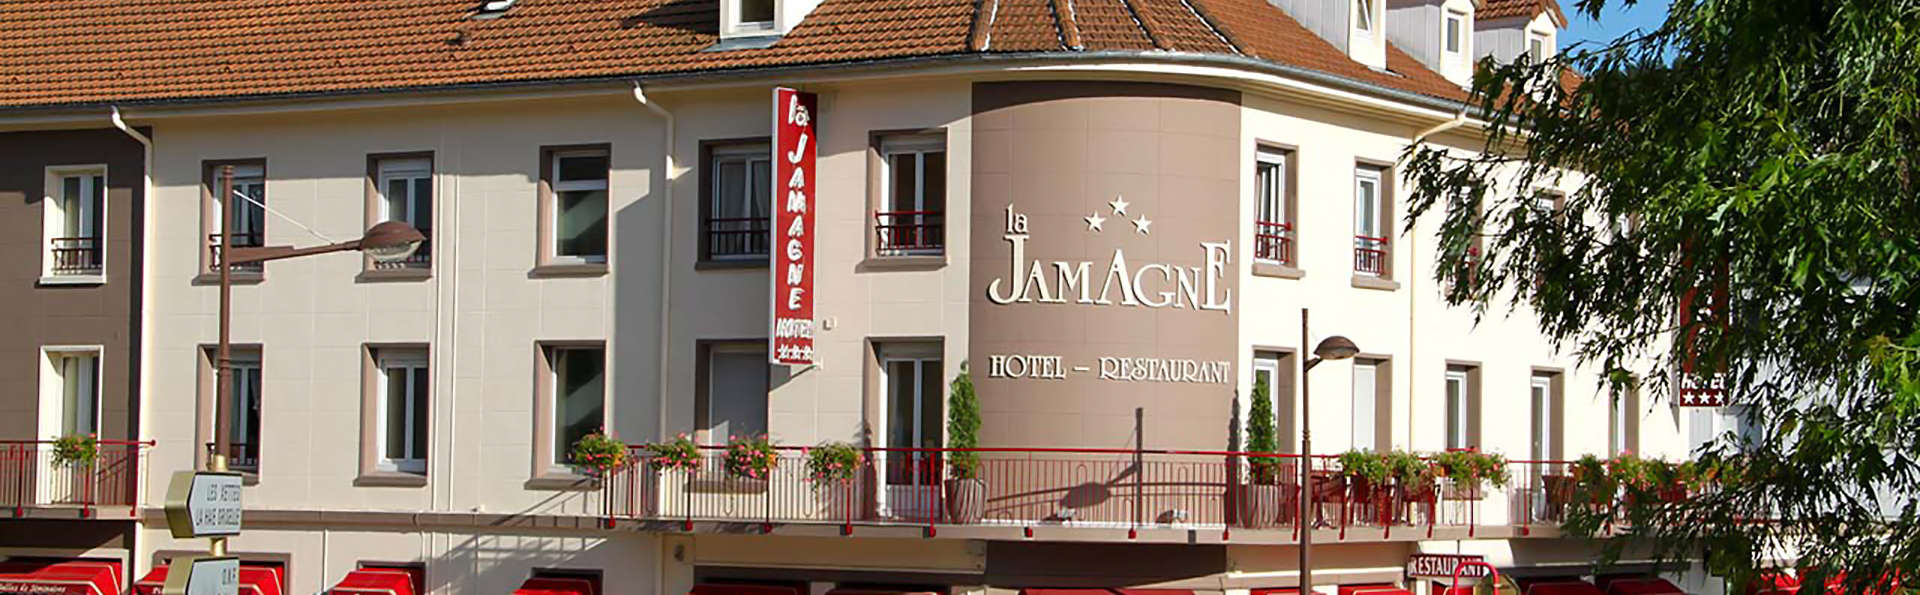 Hotel de la Jamagne & Spa  - Edit_Front.jpg